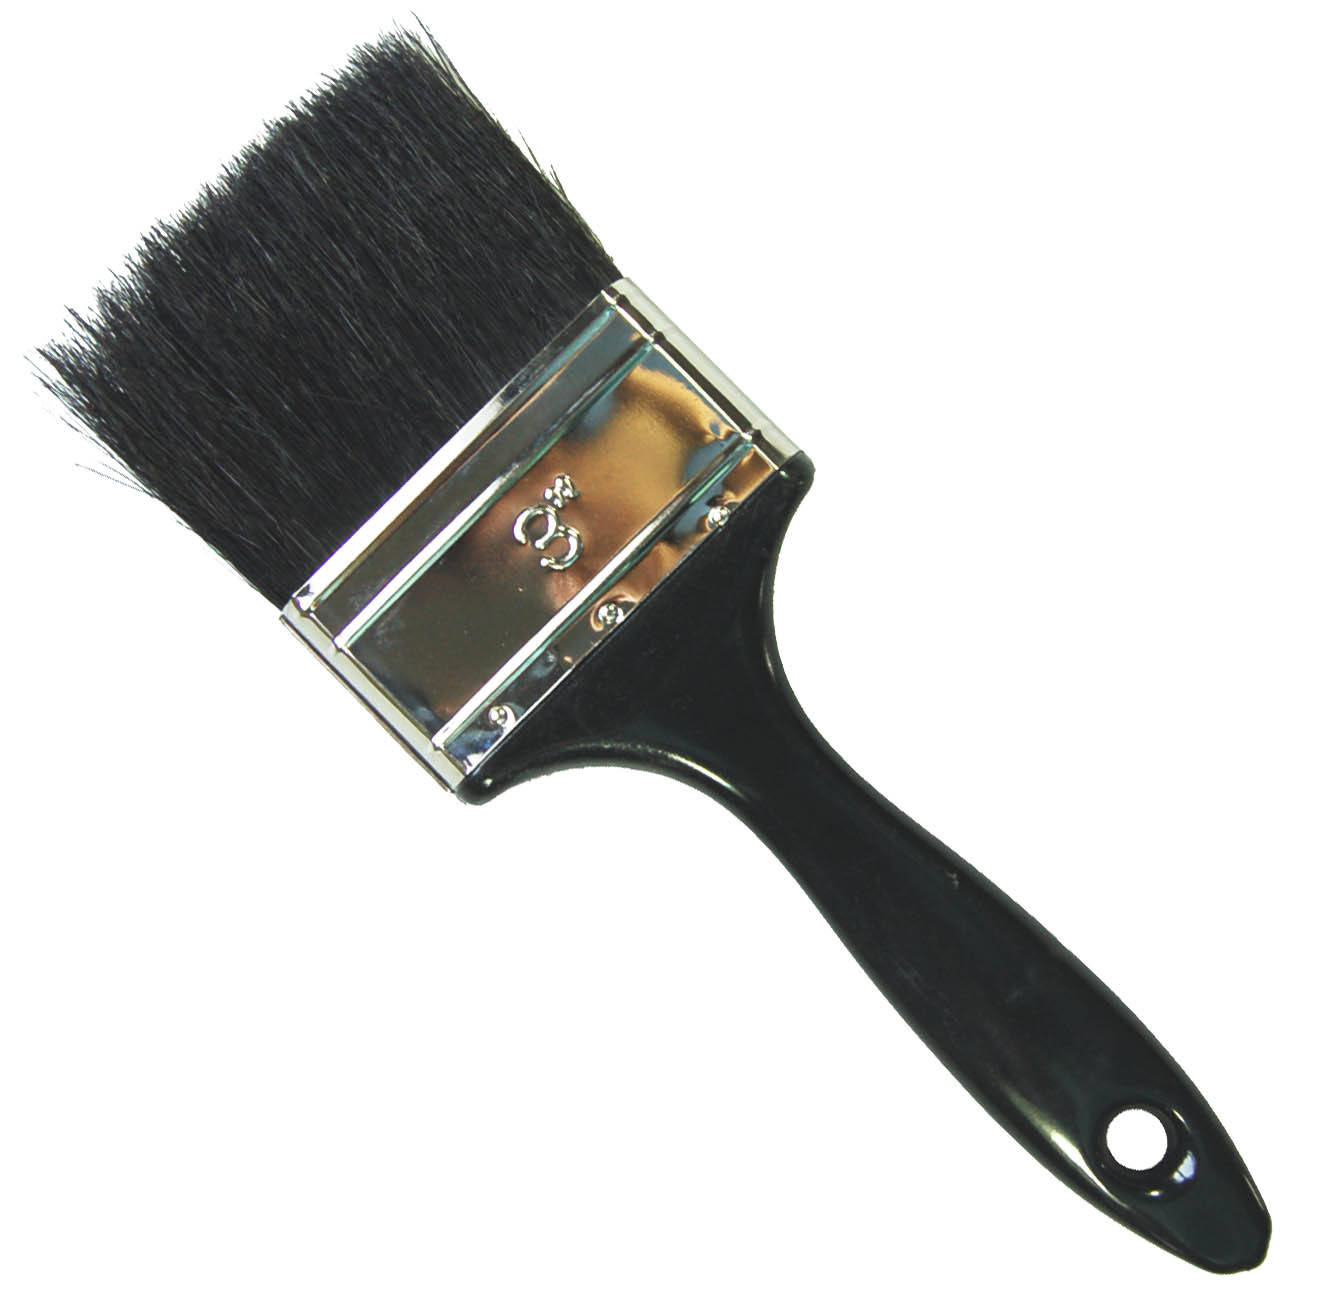 Paint Brush Economic Hand Tools / OEM Painting 75mm